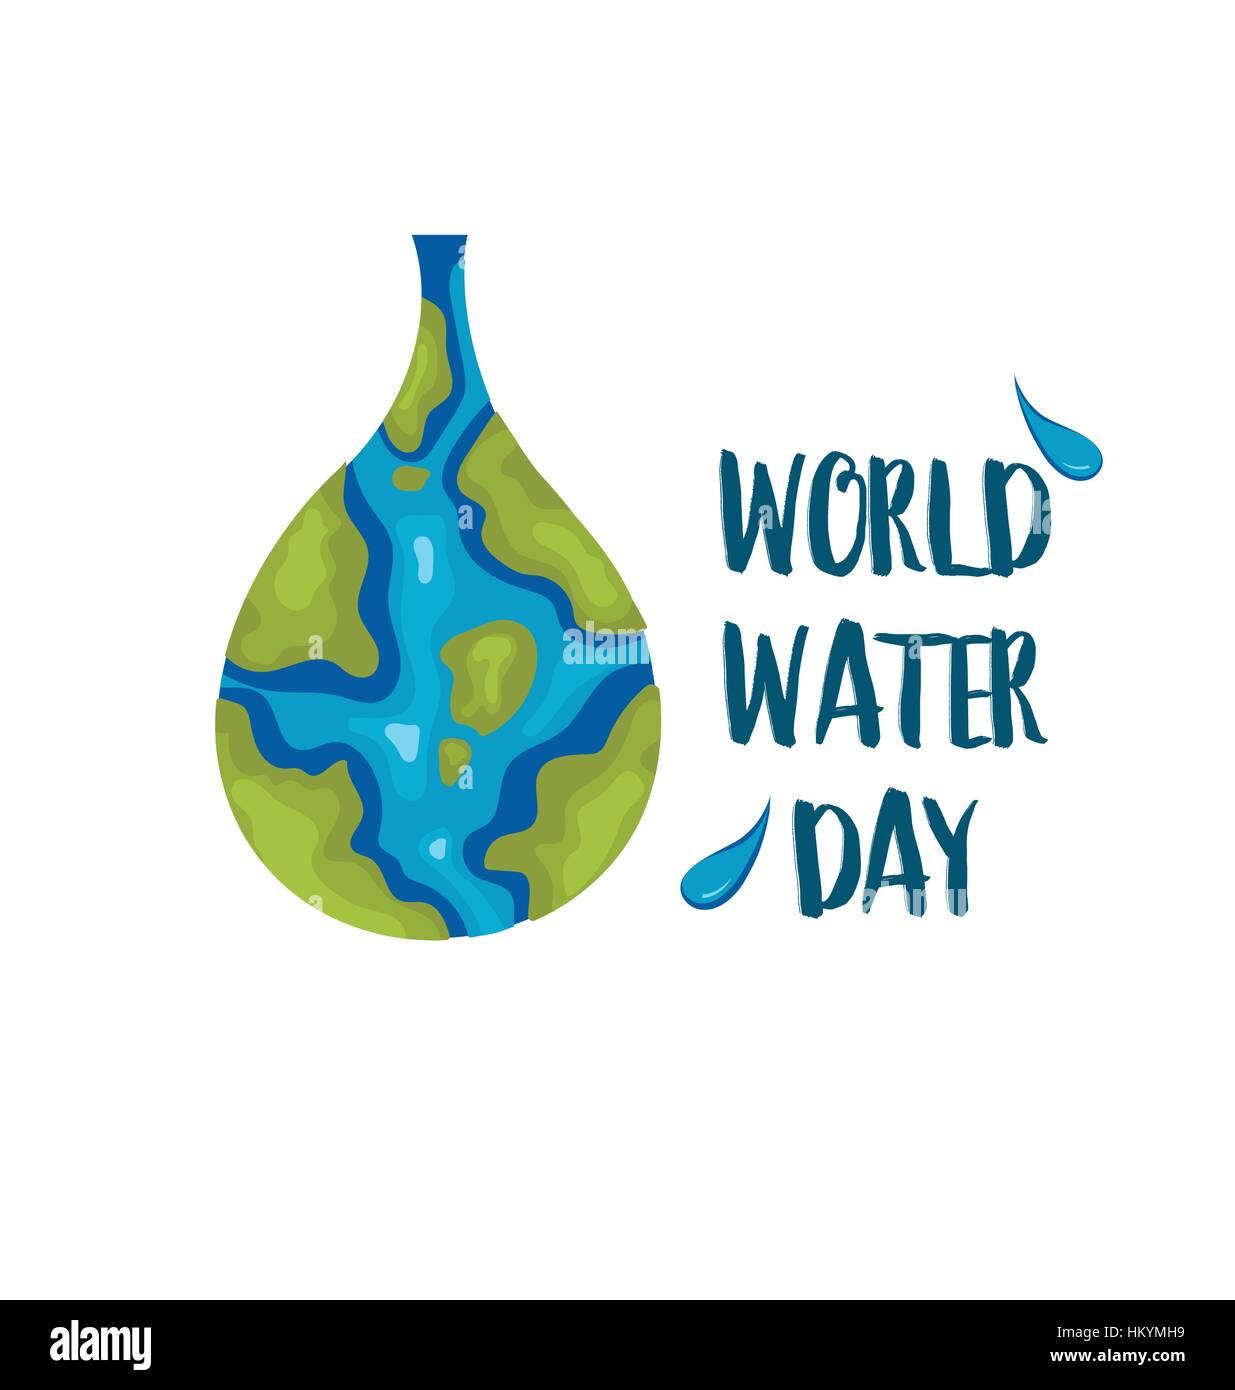 World Water Day Vector Illustration